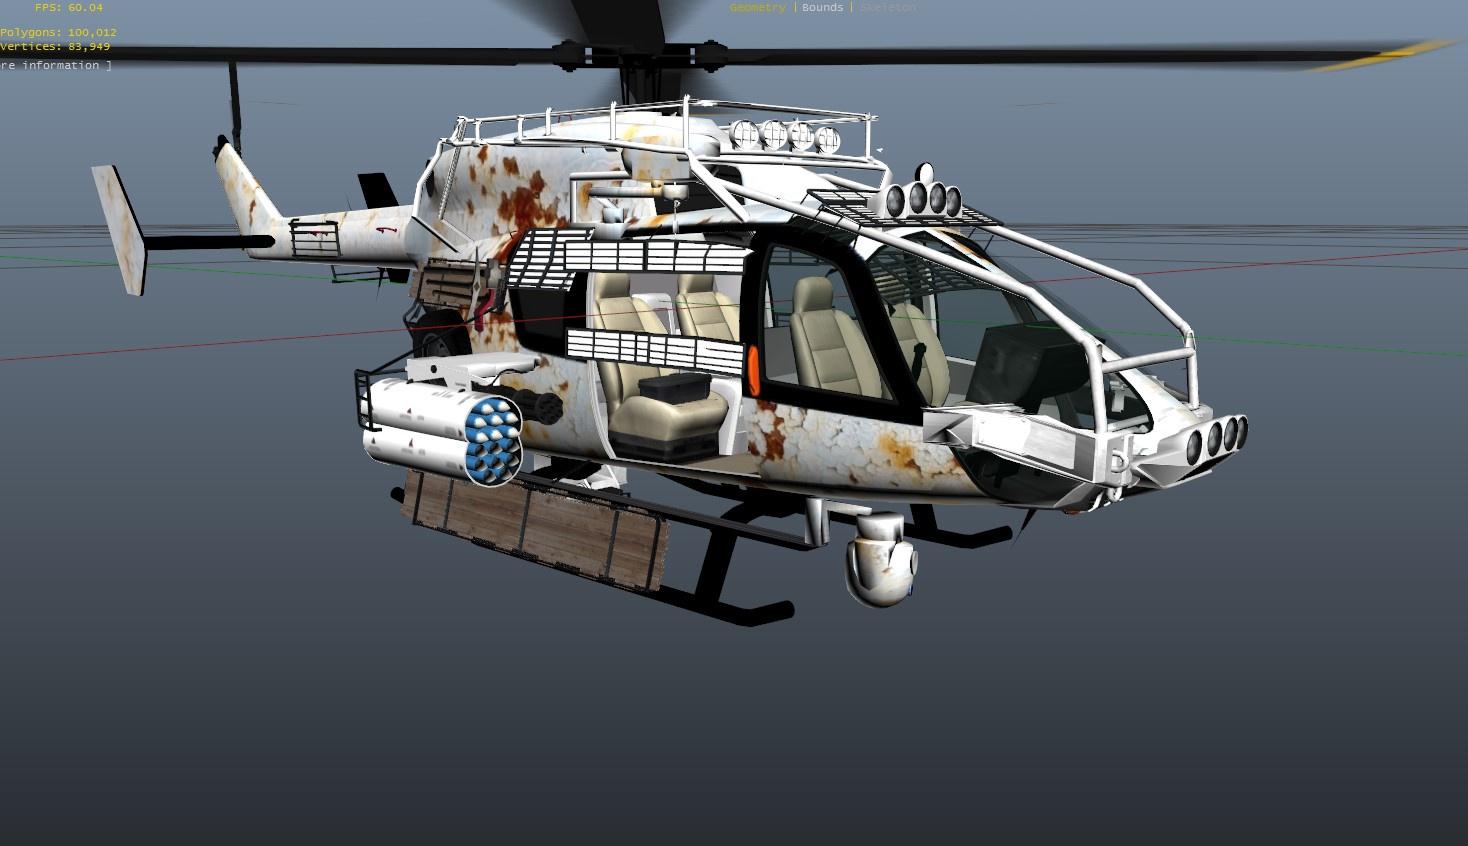 Eurocopter Ec145 Rusty Old Version Gta5 Mods Com